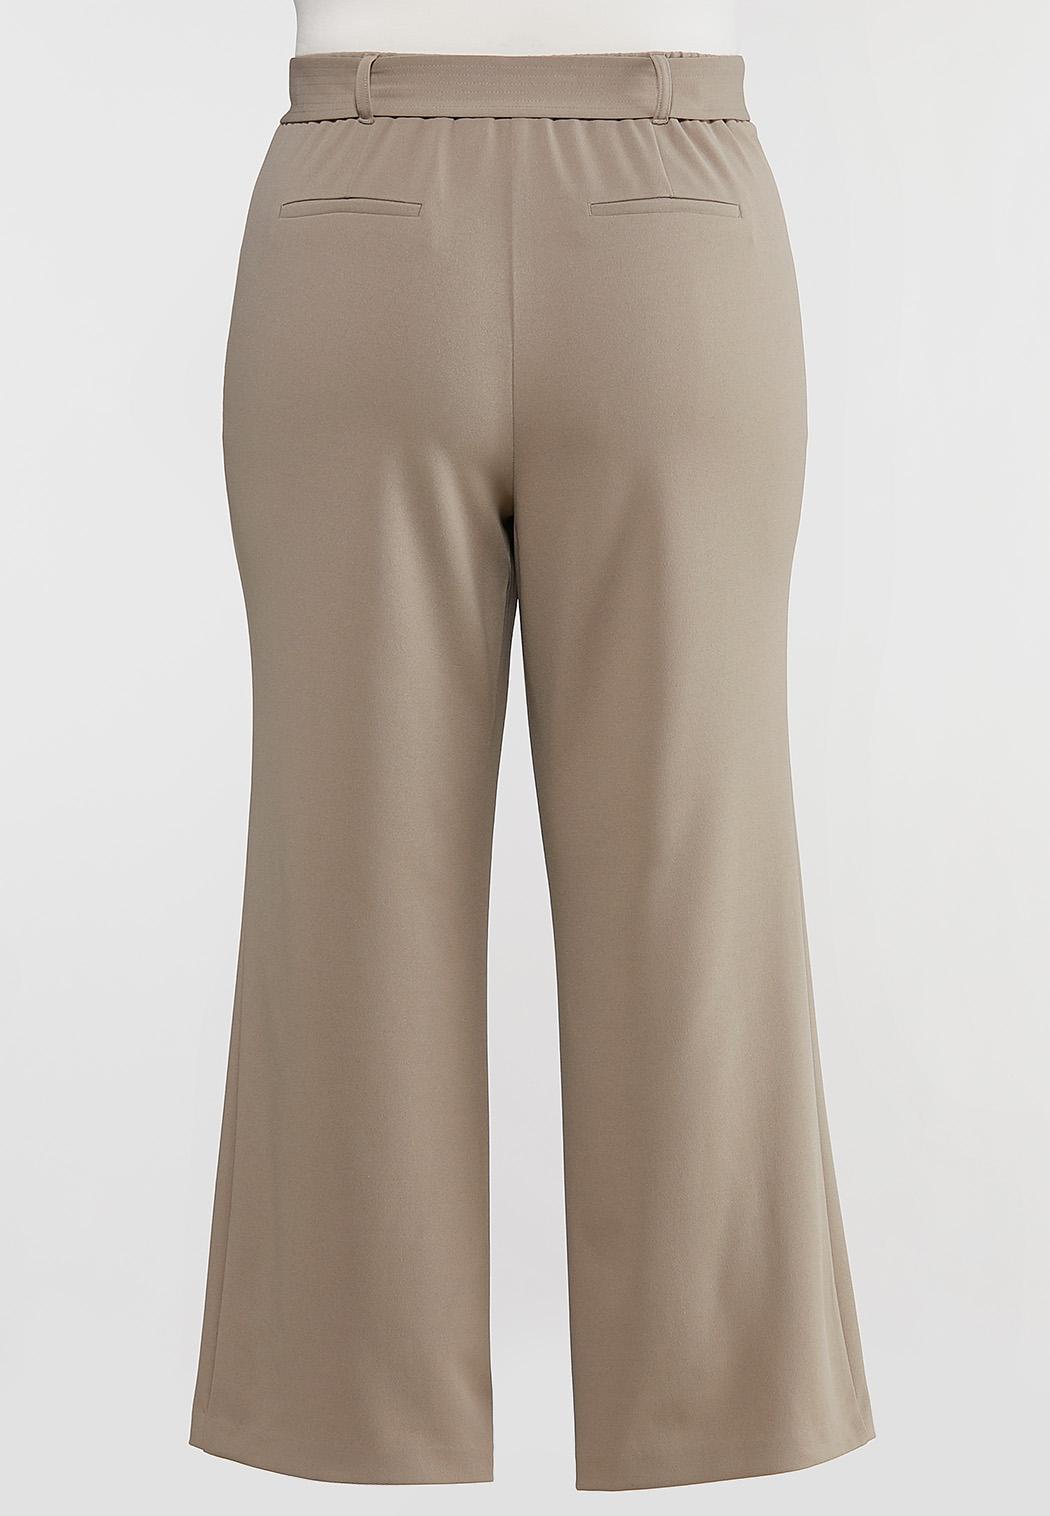 Plus Size Tortoise Belt Knit Pants (Item #44075384)